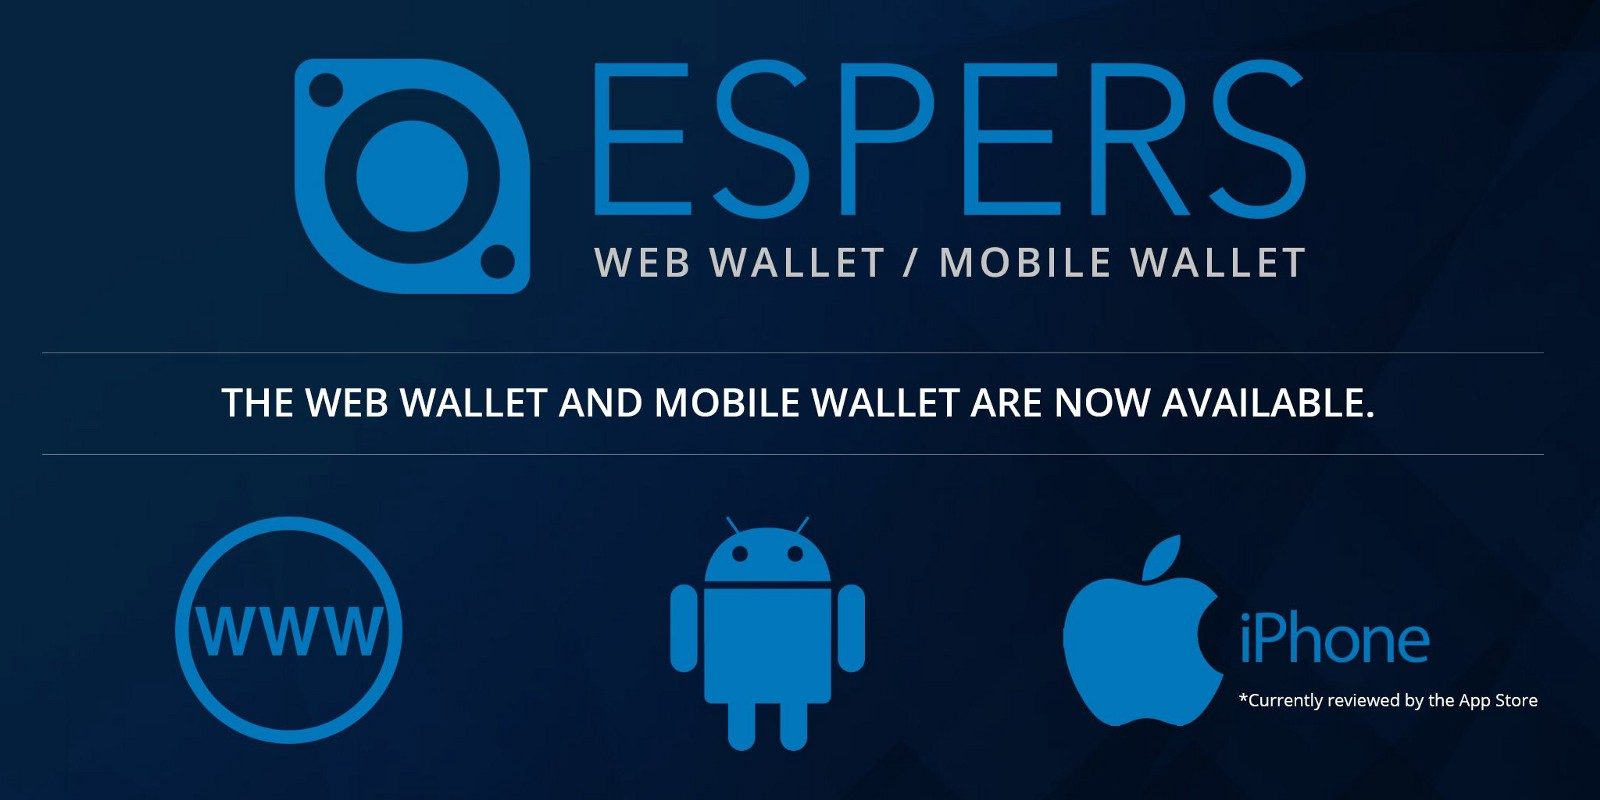 Espers web wallet